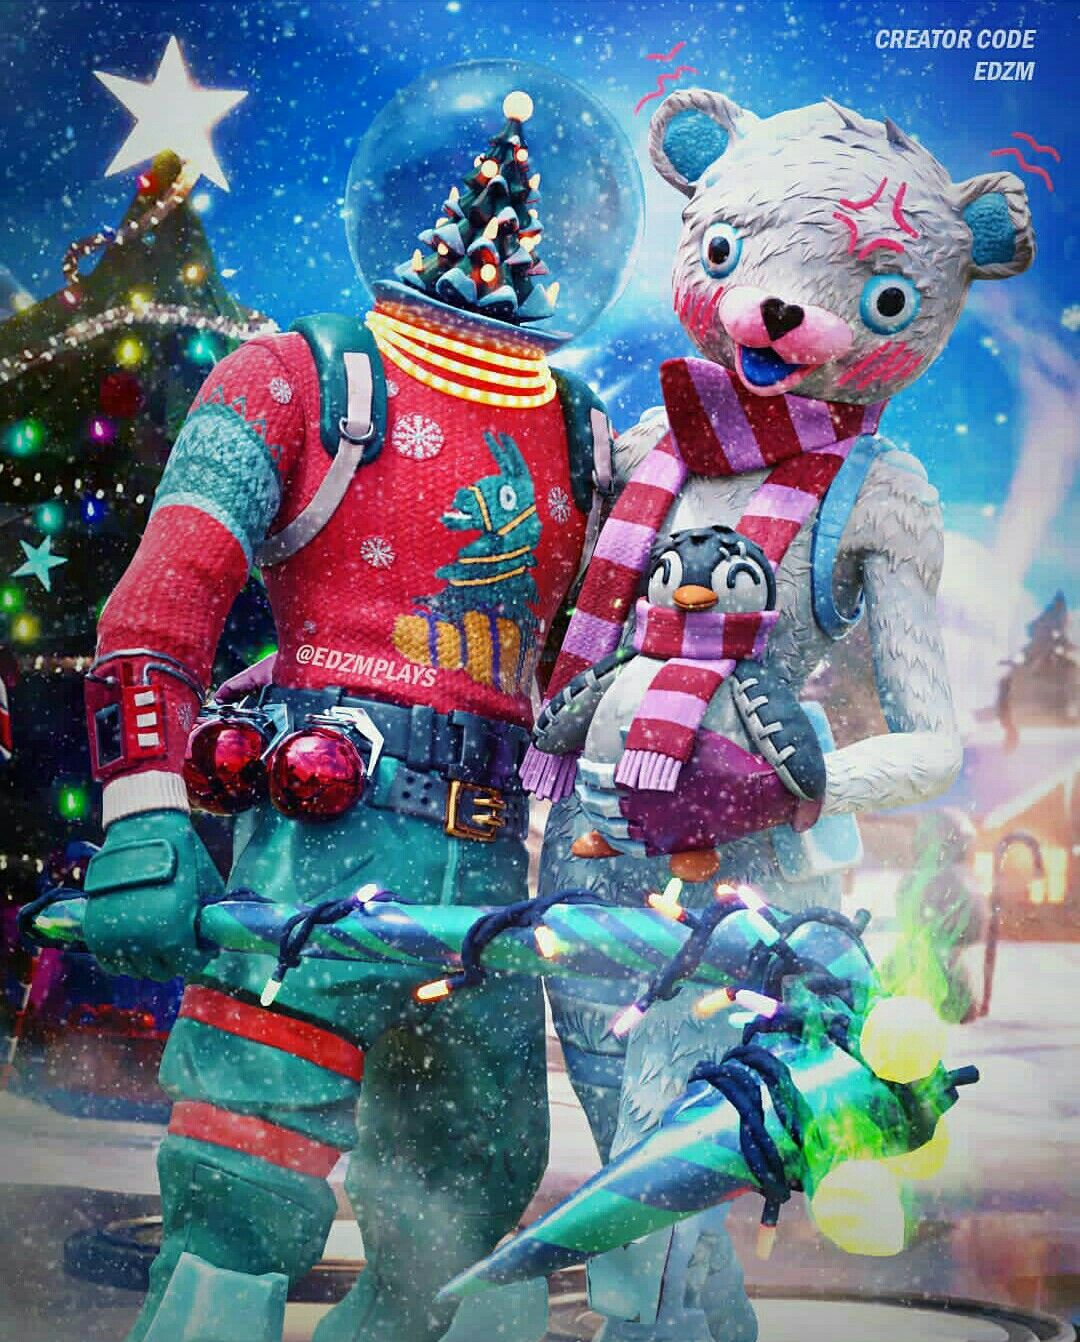 Merry Christmas Fortnite Fortnite Epic Games Fortnite Gaming Wallpapers